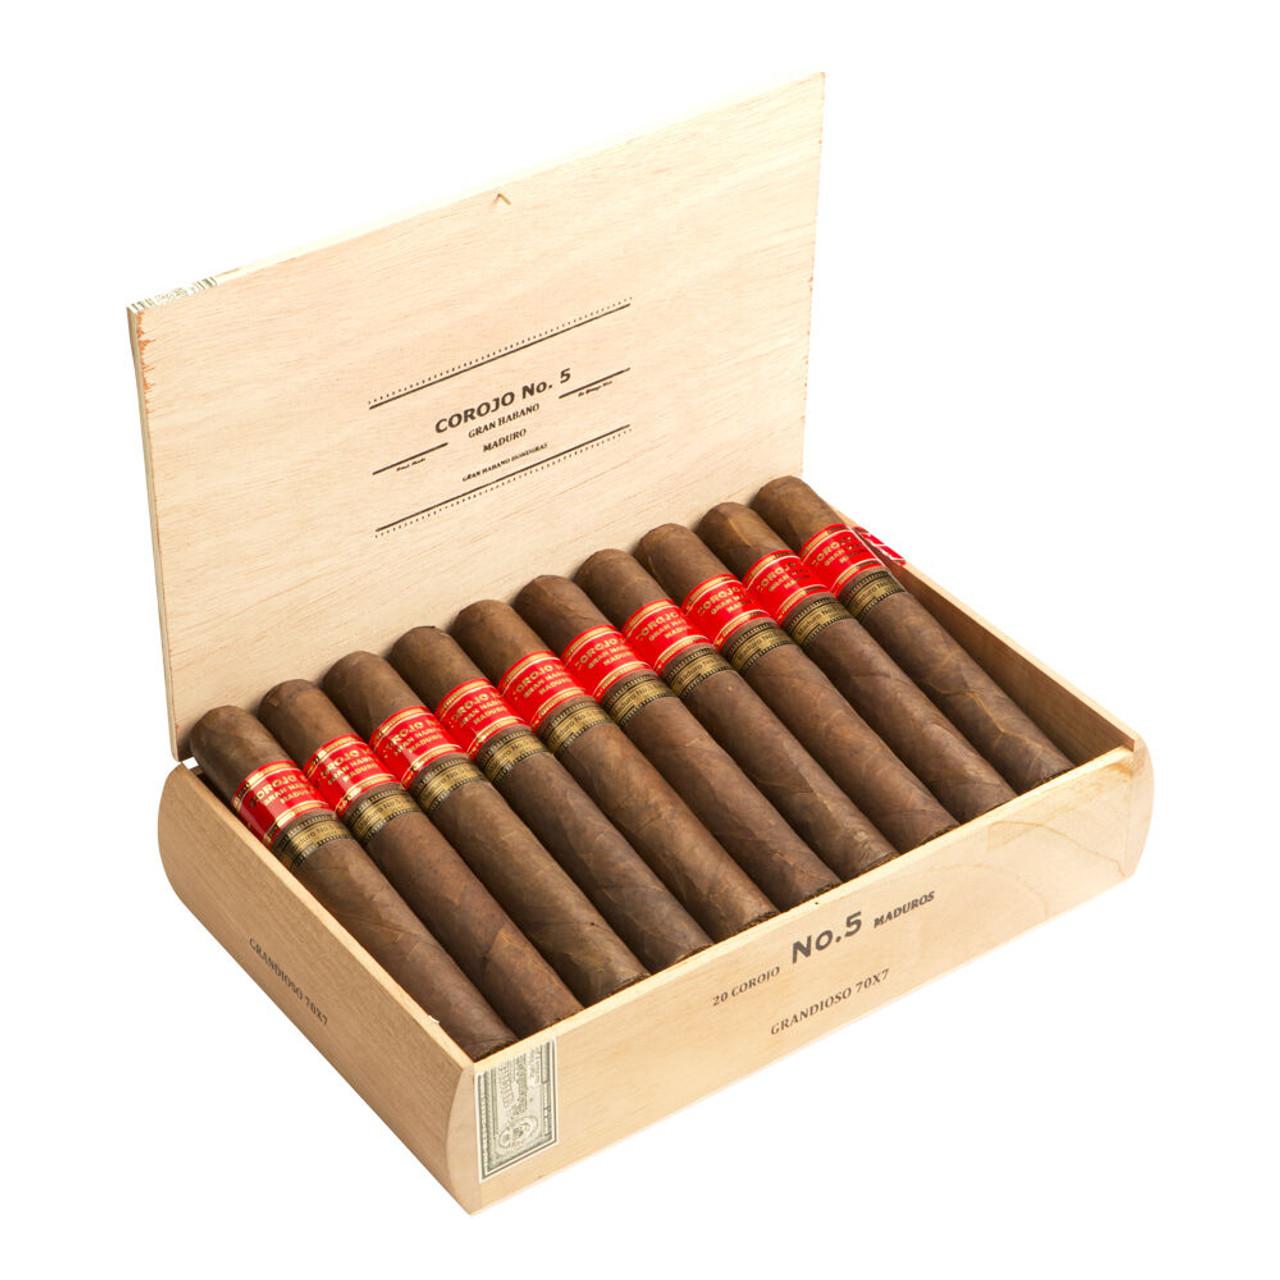 Gran Habano #5 Maduro Triumph Cigars - 5.0 x 52 (Box of 20)